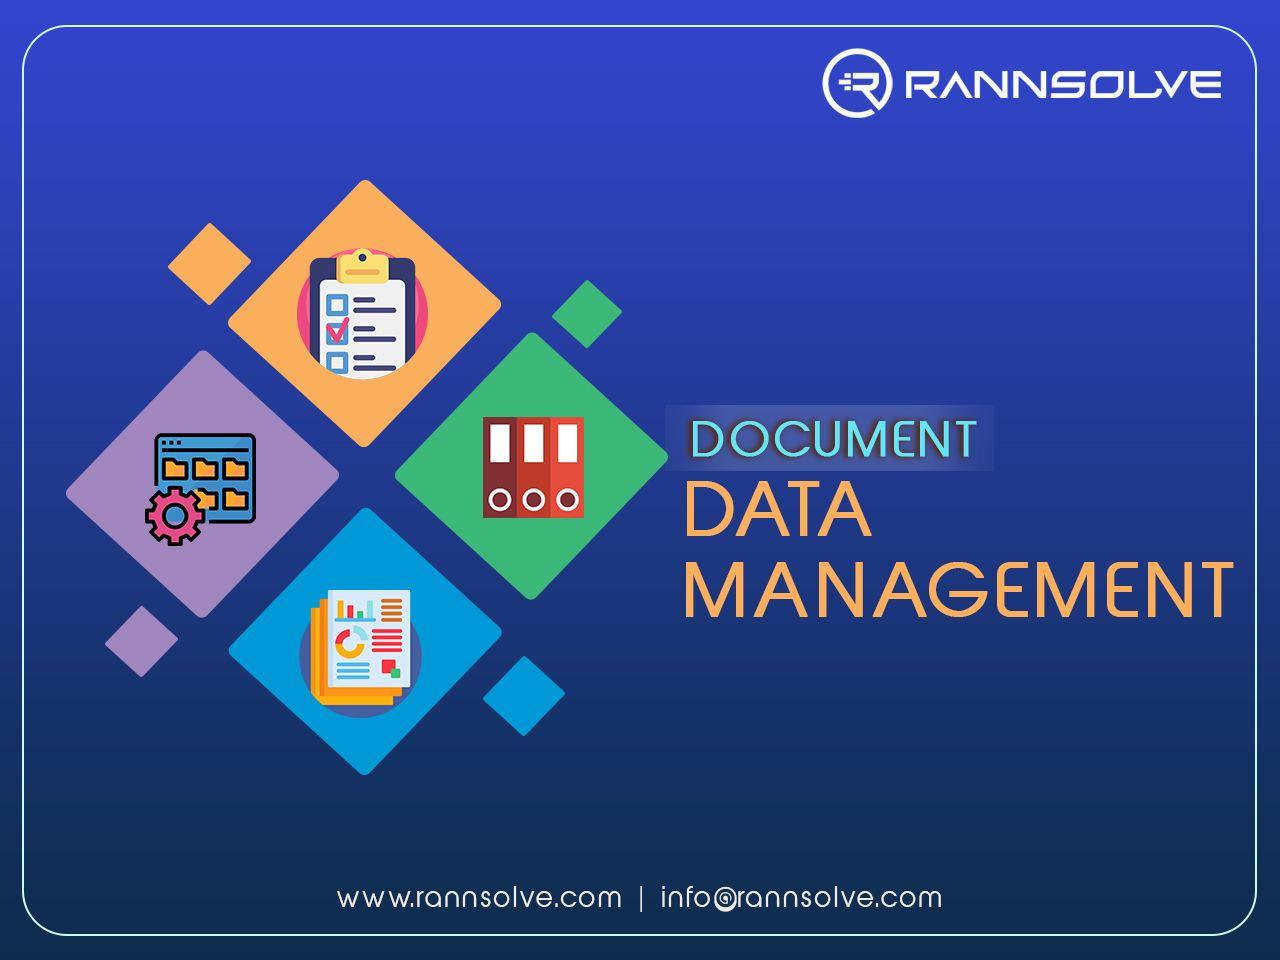 Document Management Services Management Documents Data Entry